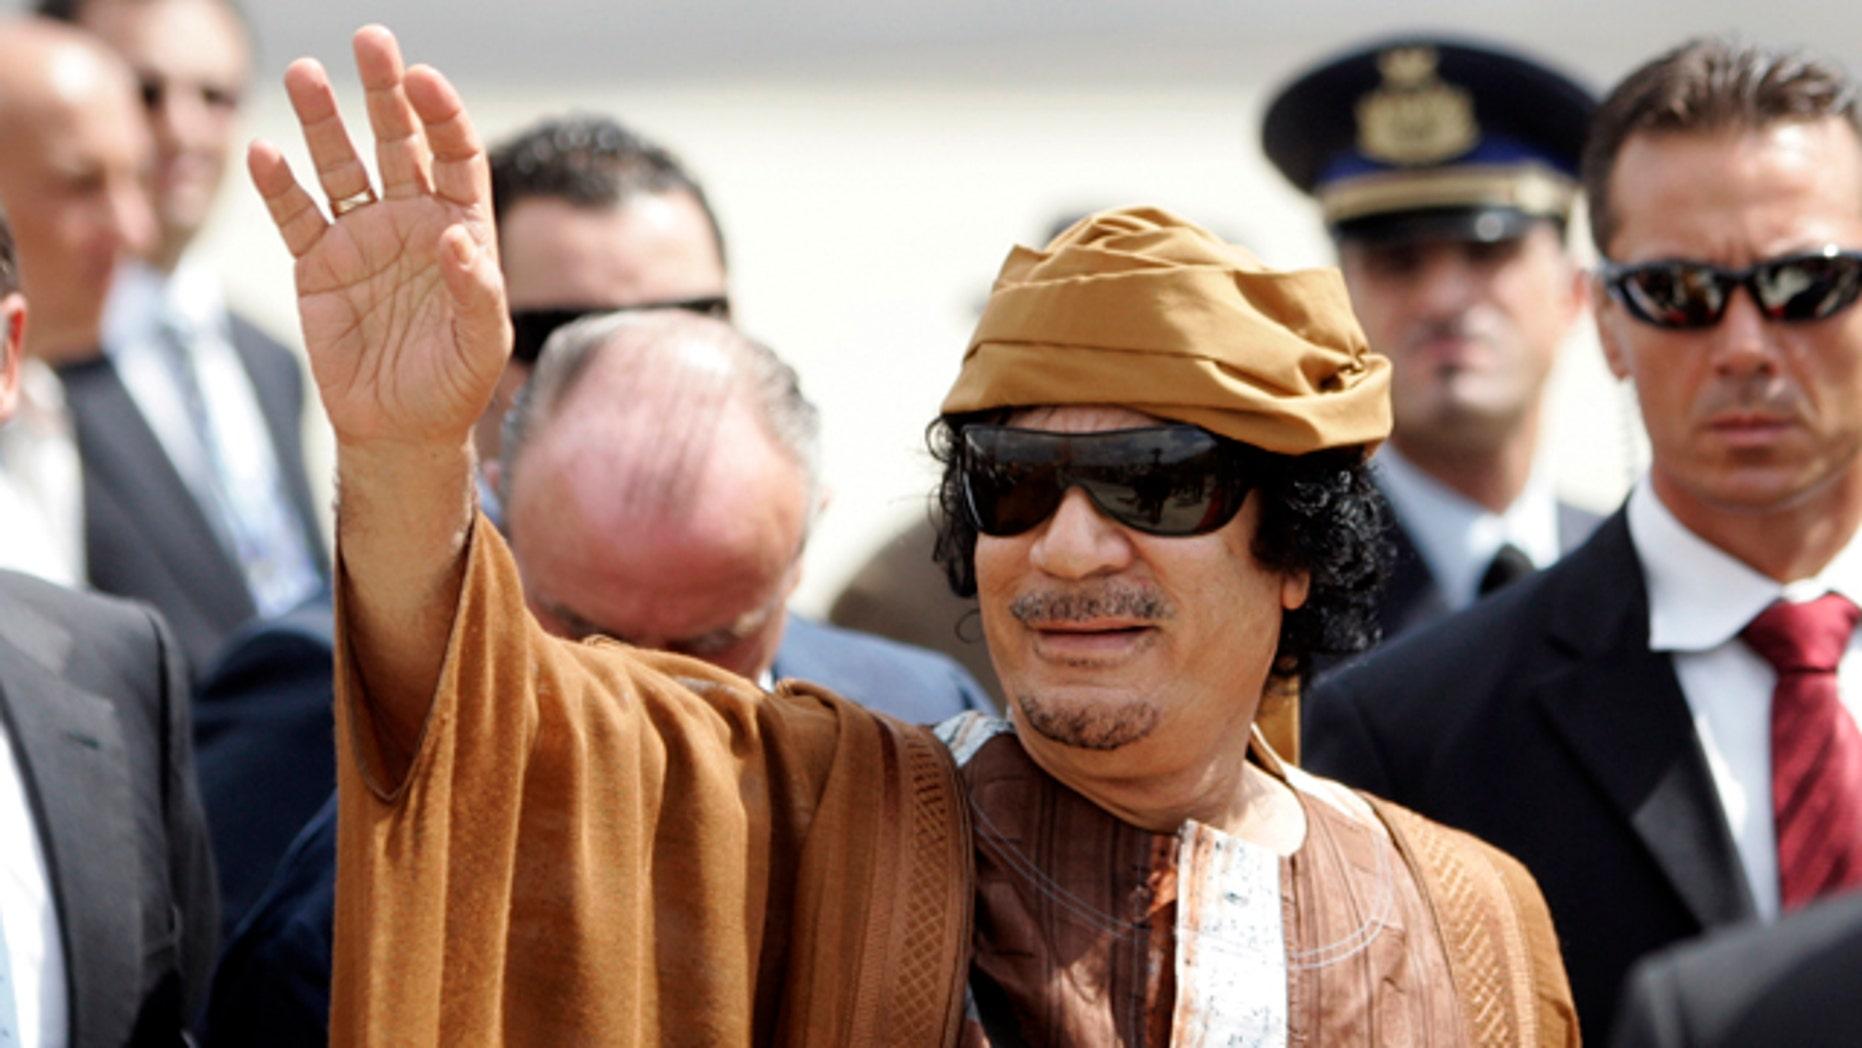 Aug. 29, 2010: Libyan leader Muammar Qaddafi gestures as he arrives at Ciampino airport, near Rome.